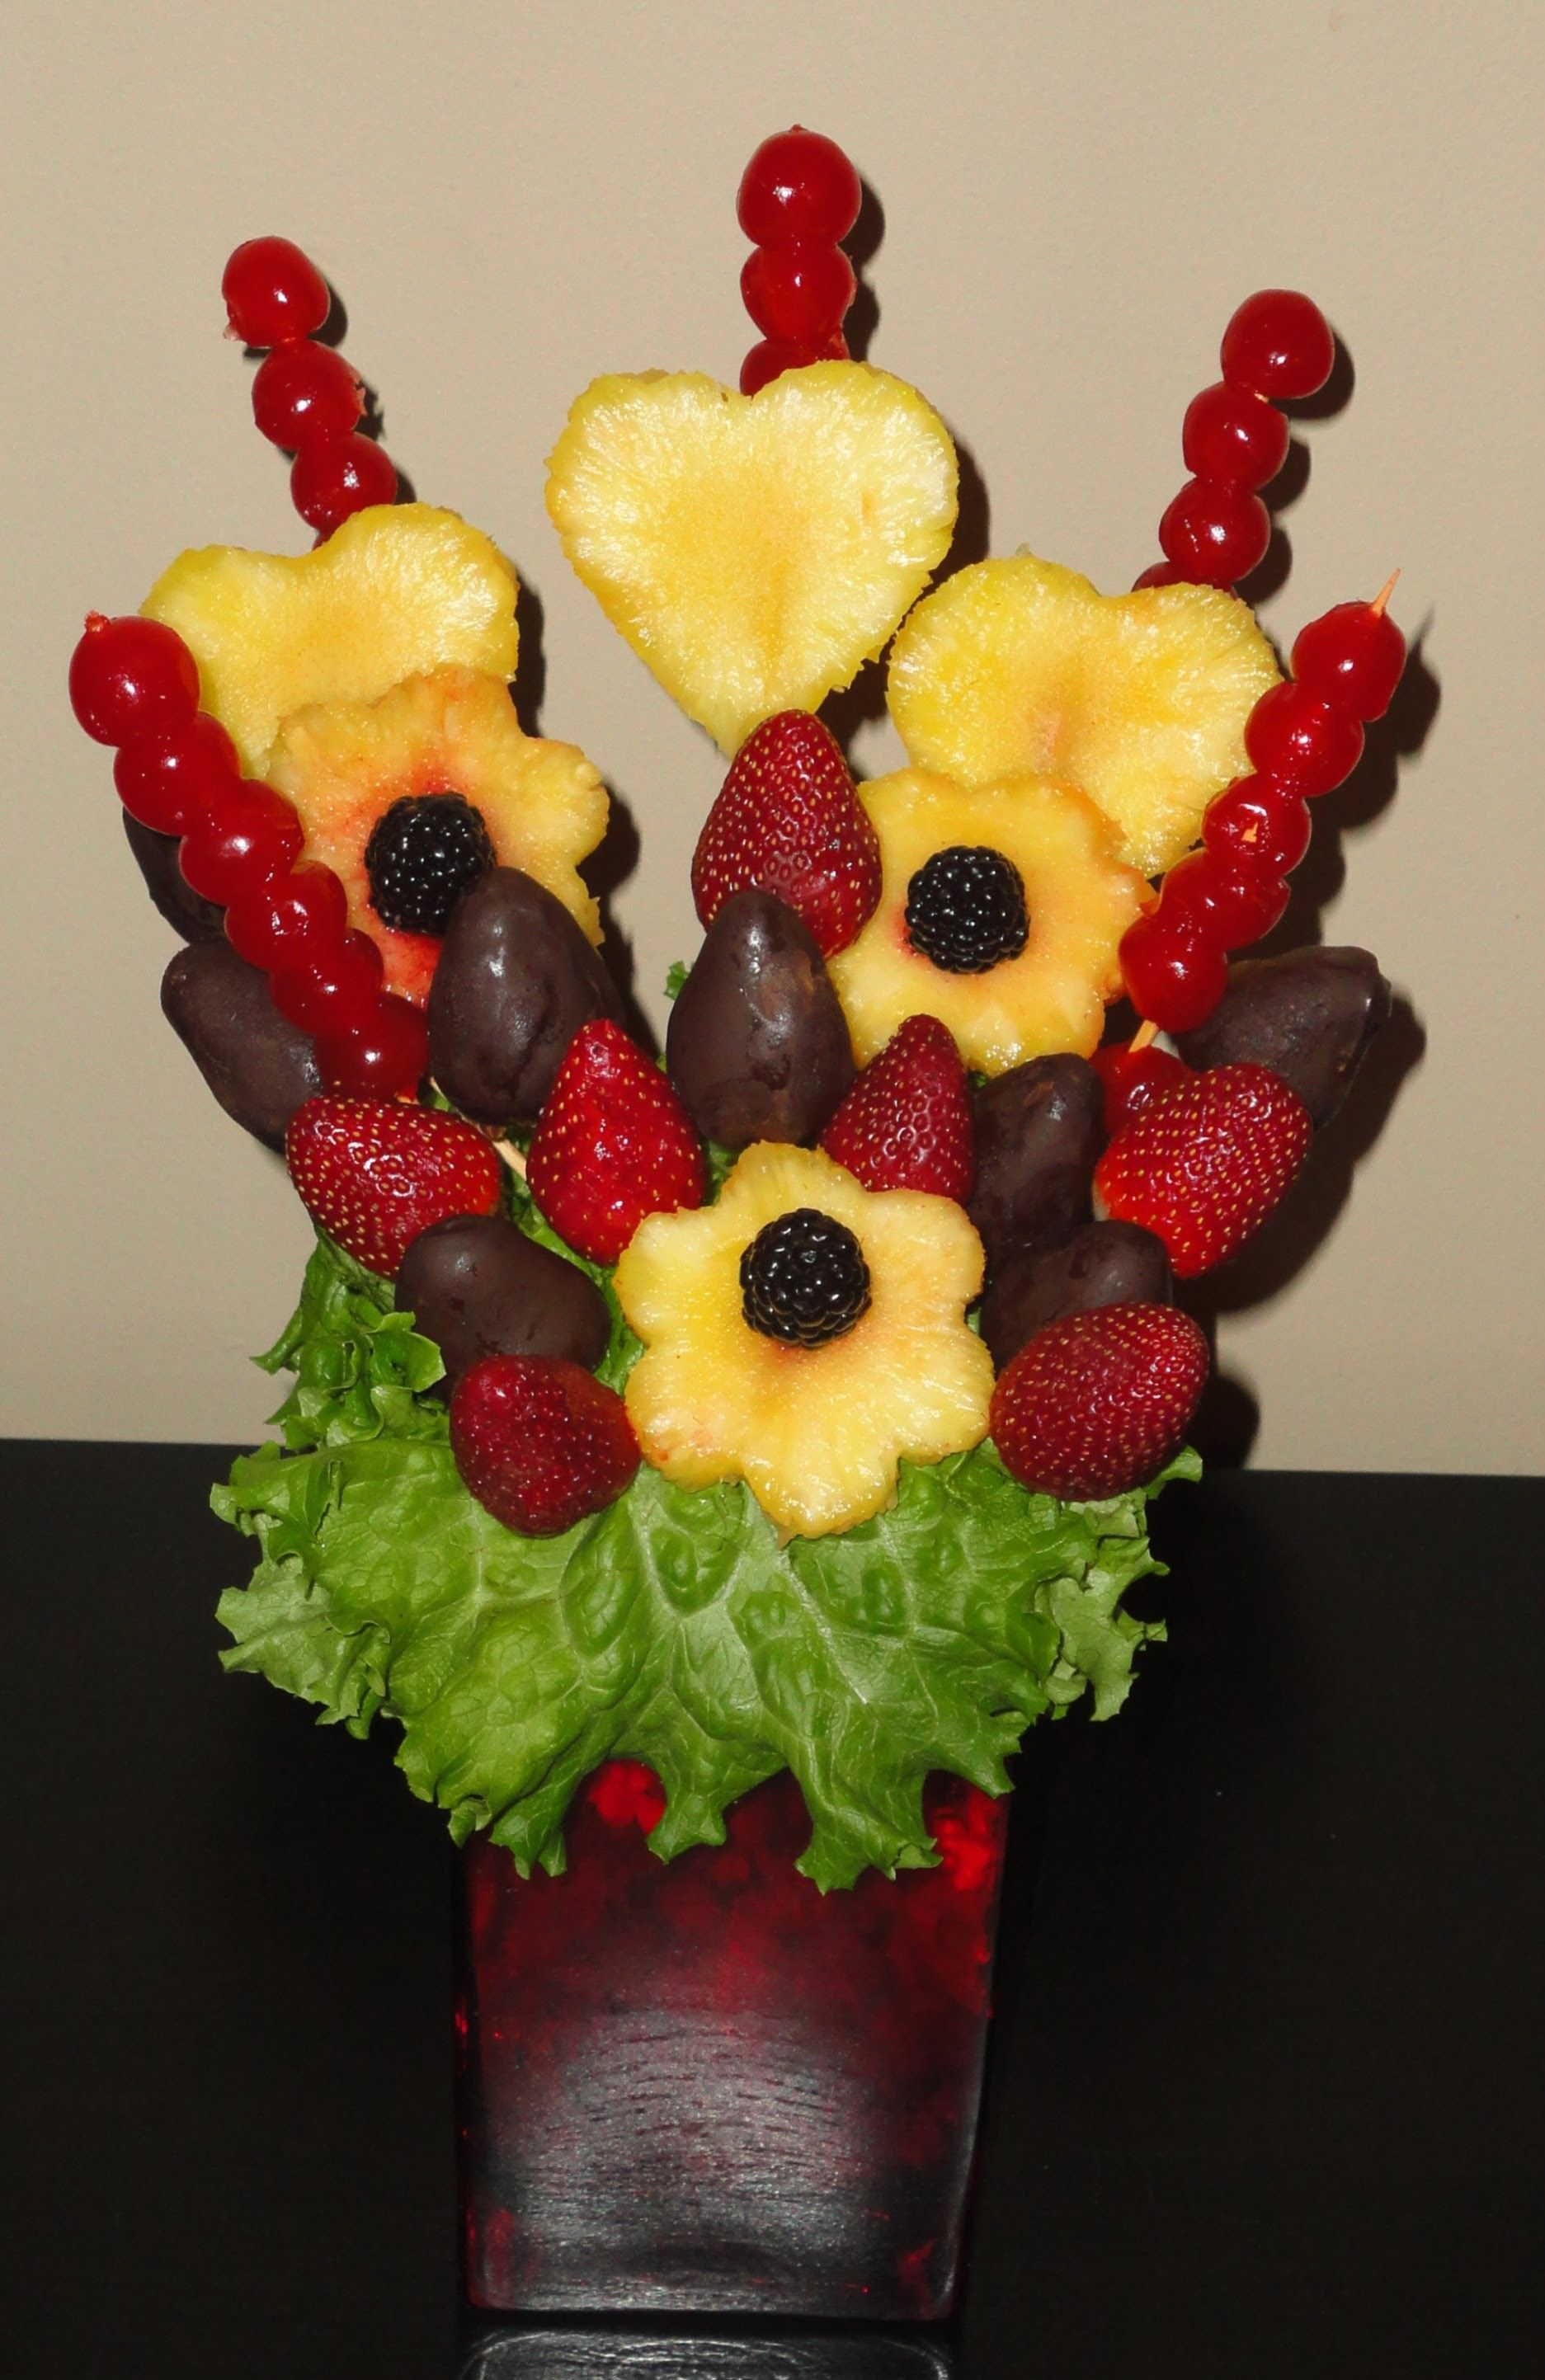 Edible fruit centerpiece arrangement | Edible fruit ...